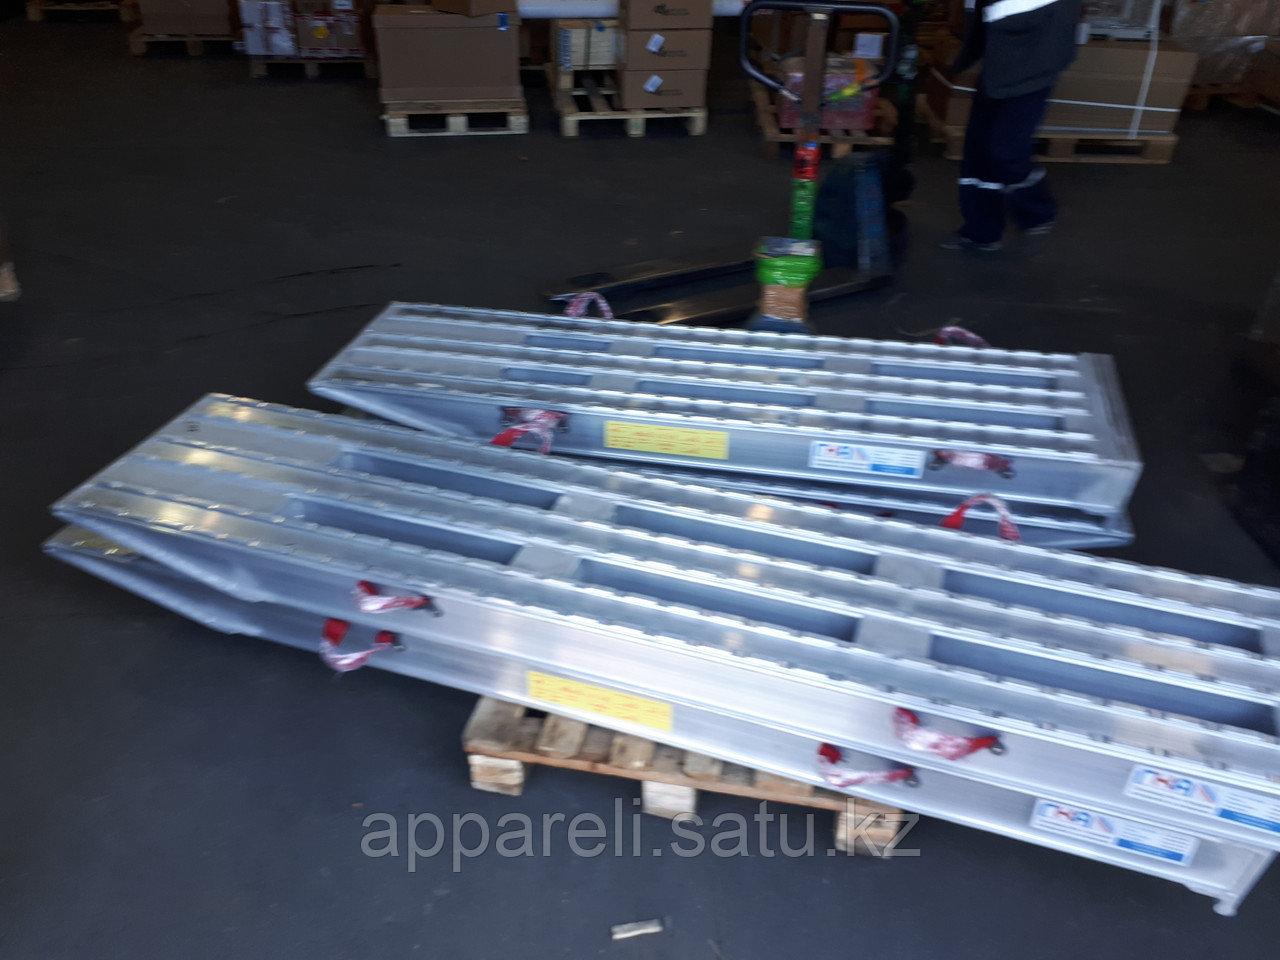 Аппарели для спецтехники 32-45 тонн